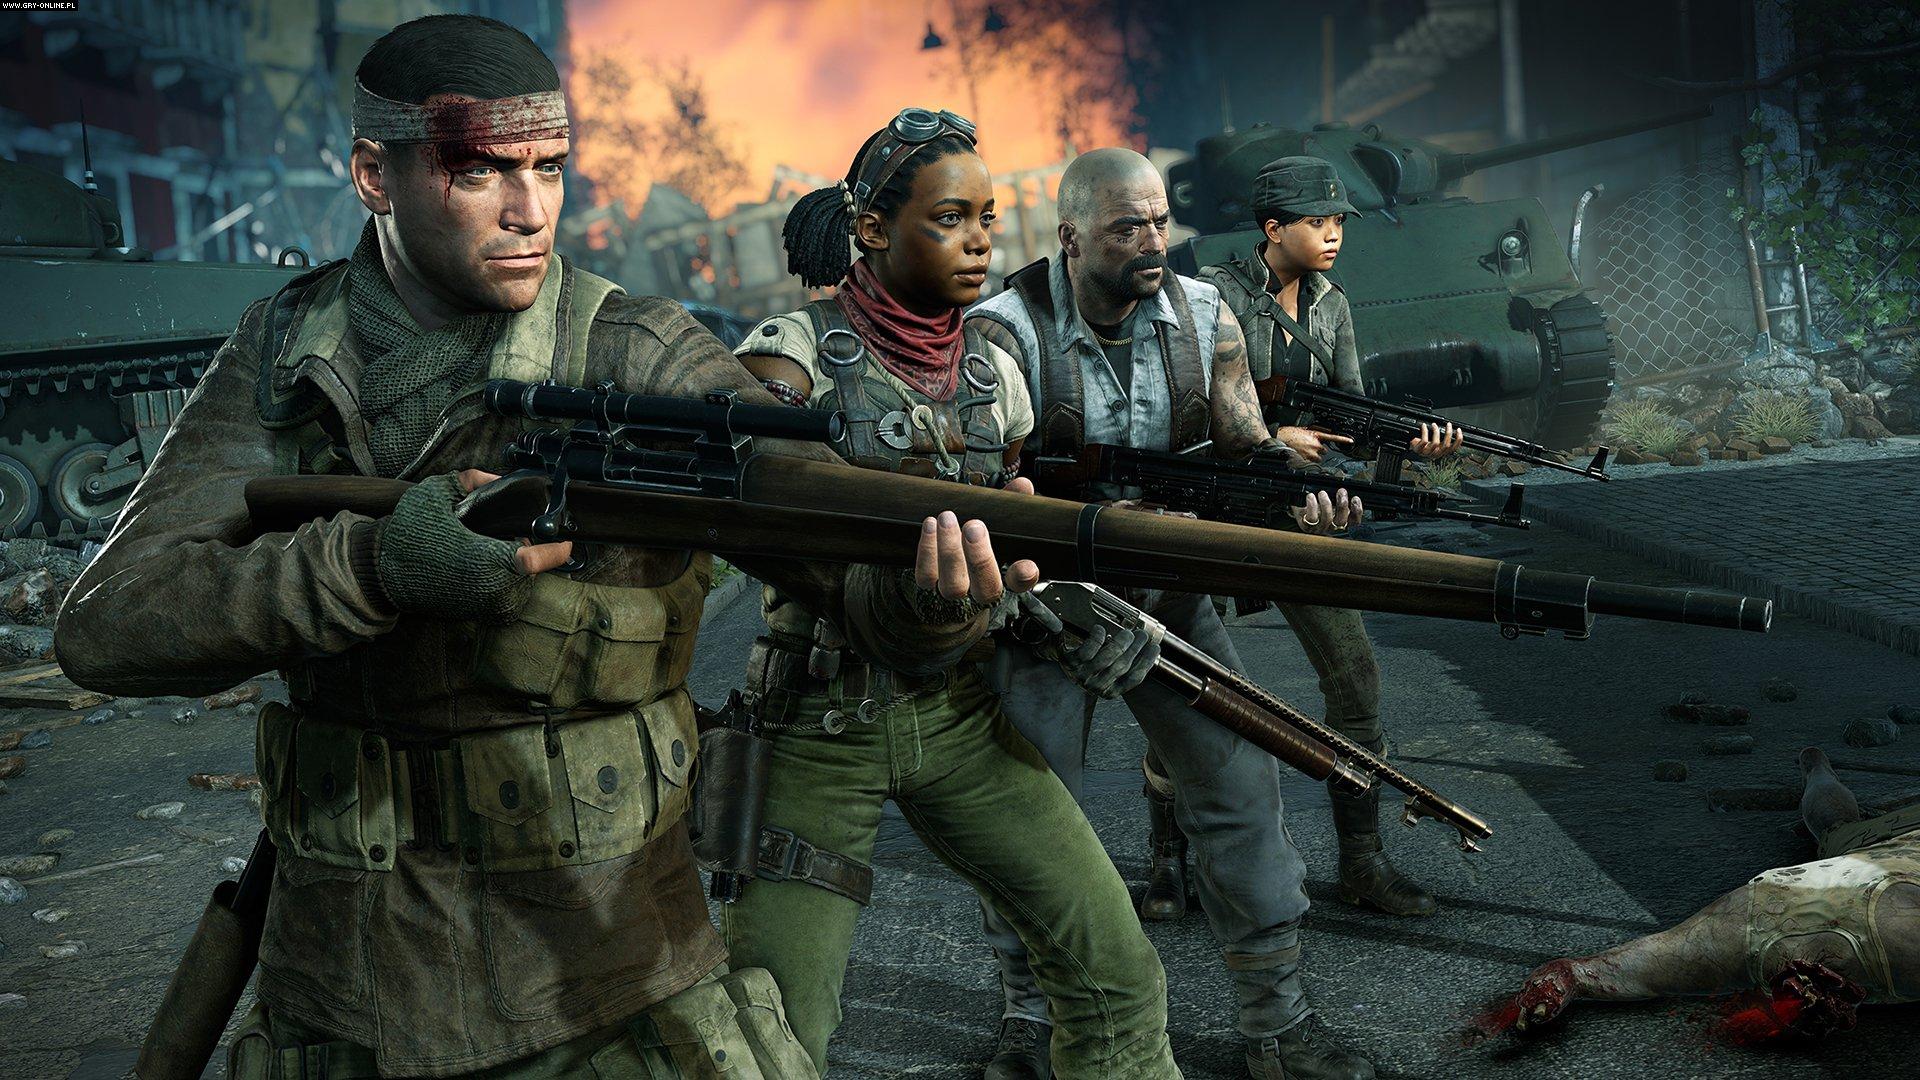 Zombie Army 4: Dead War PC, PS4, XONE Games Image 2/27, Rebellion